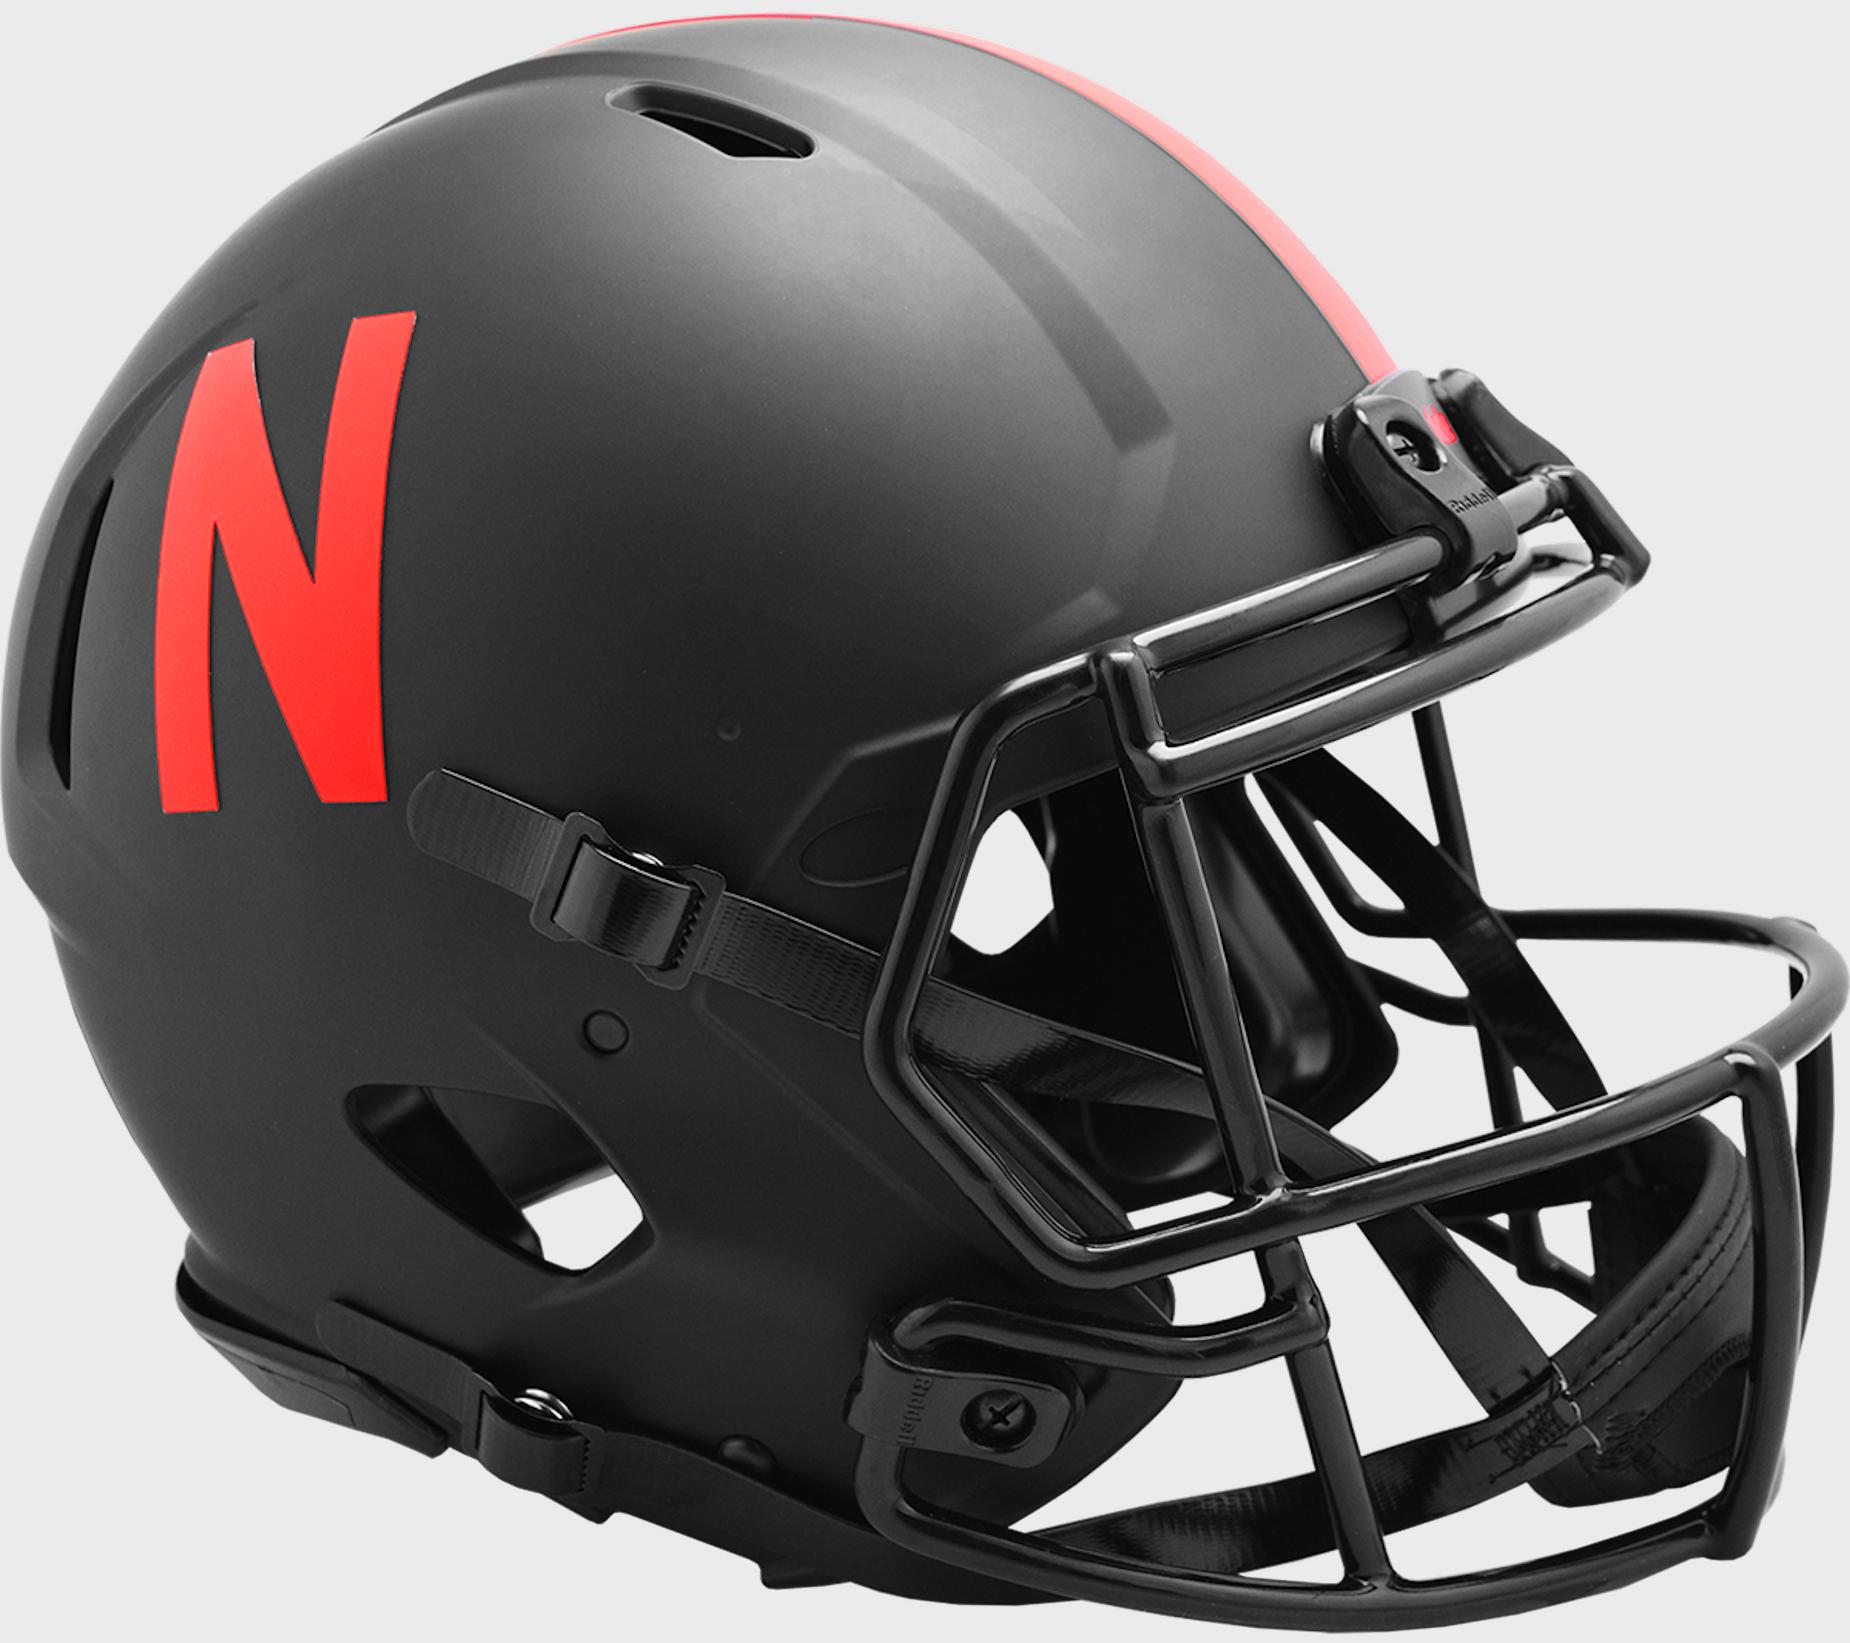 Nebraska Cornhuskers Speed Football Helmet <B>ECLIPSE</B>